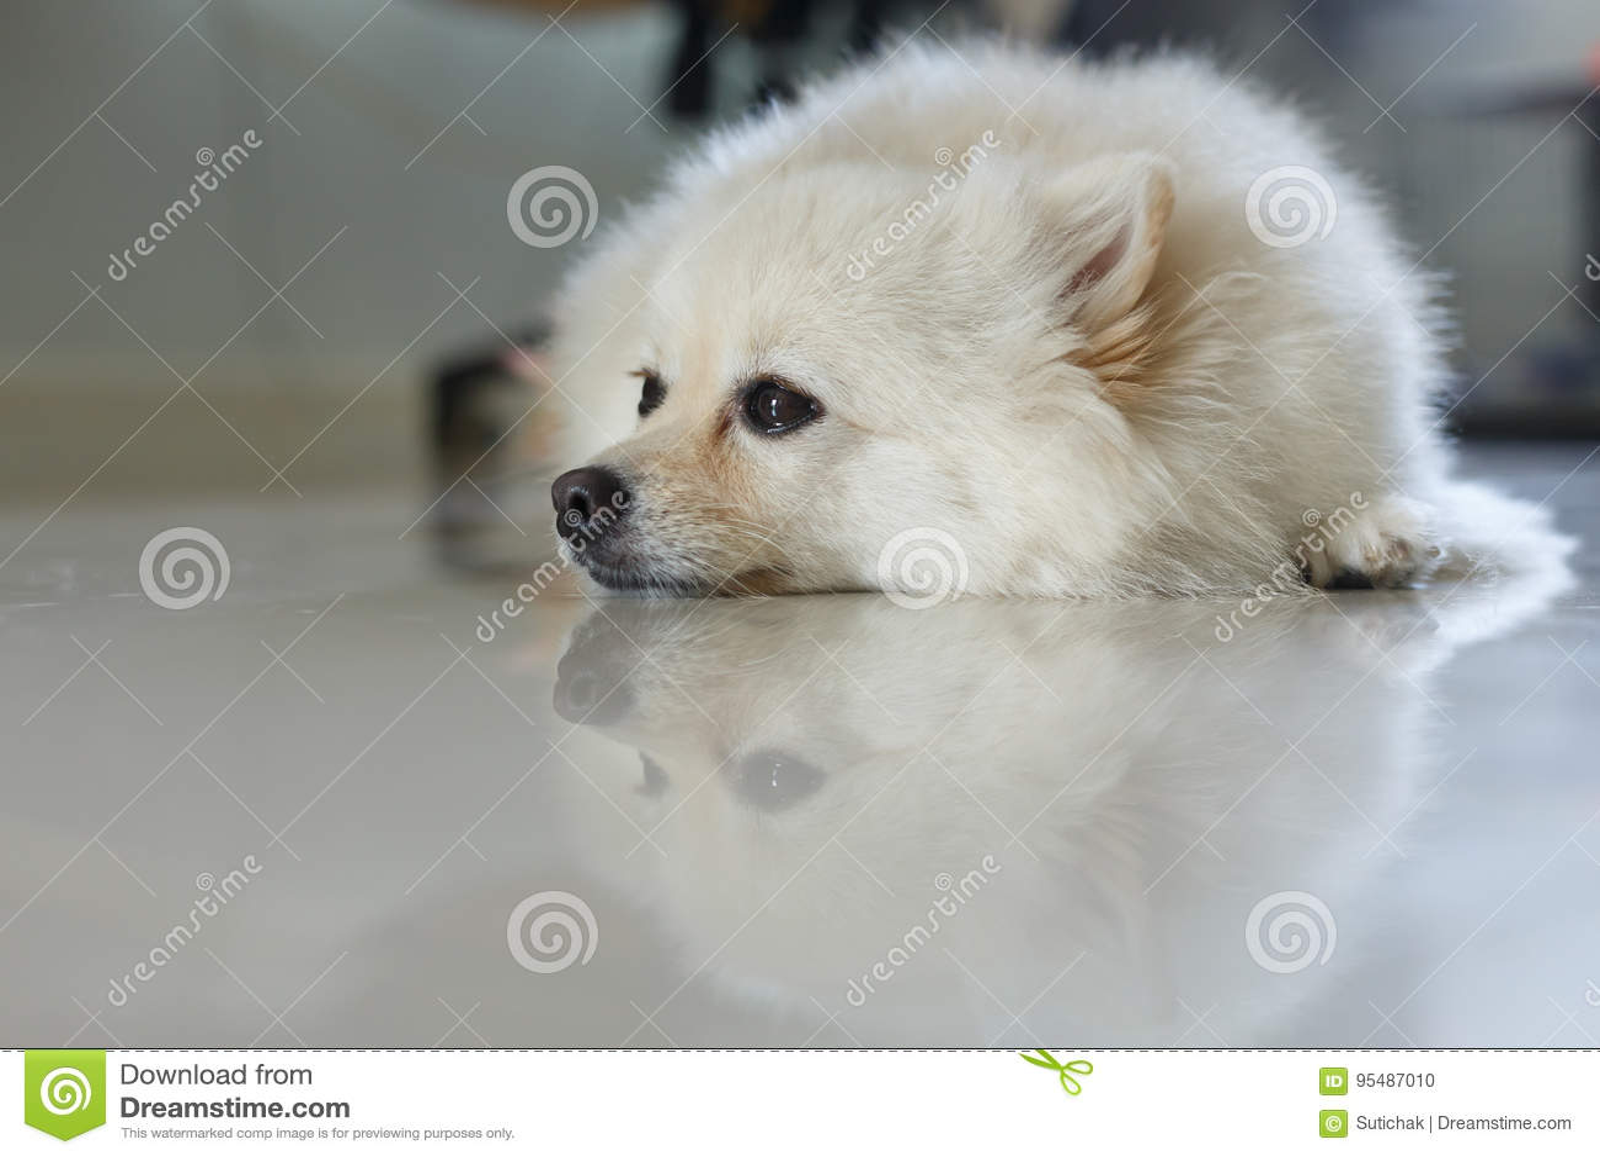 White Pomeranian Cute Dog Stock Photo Image Of Pretty 95487010